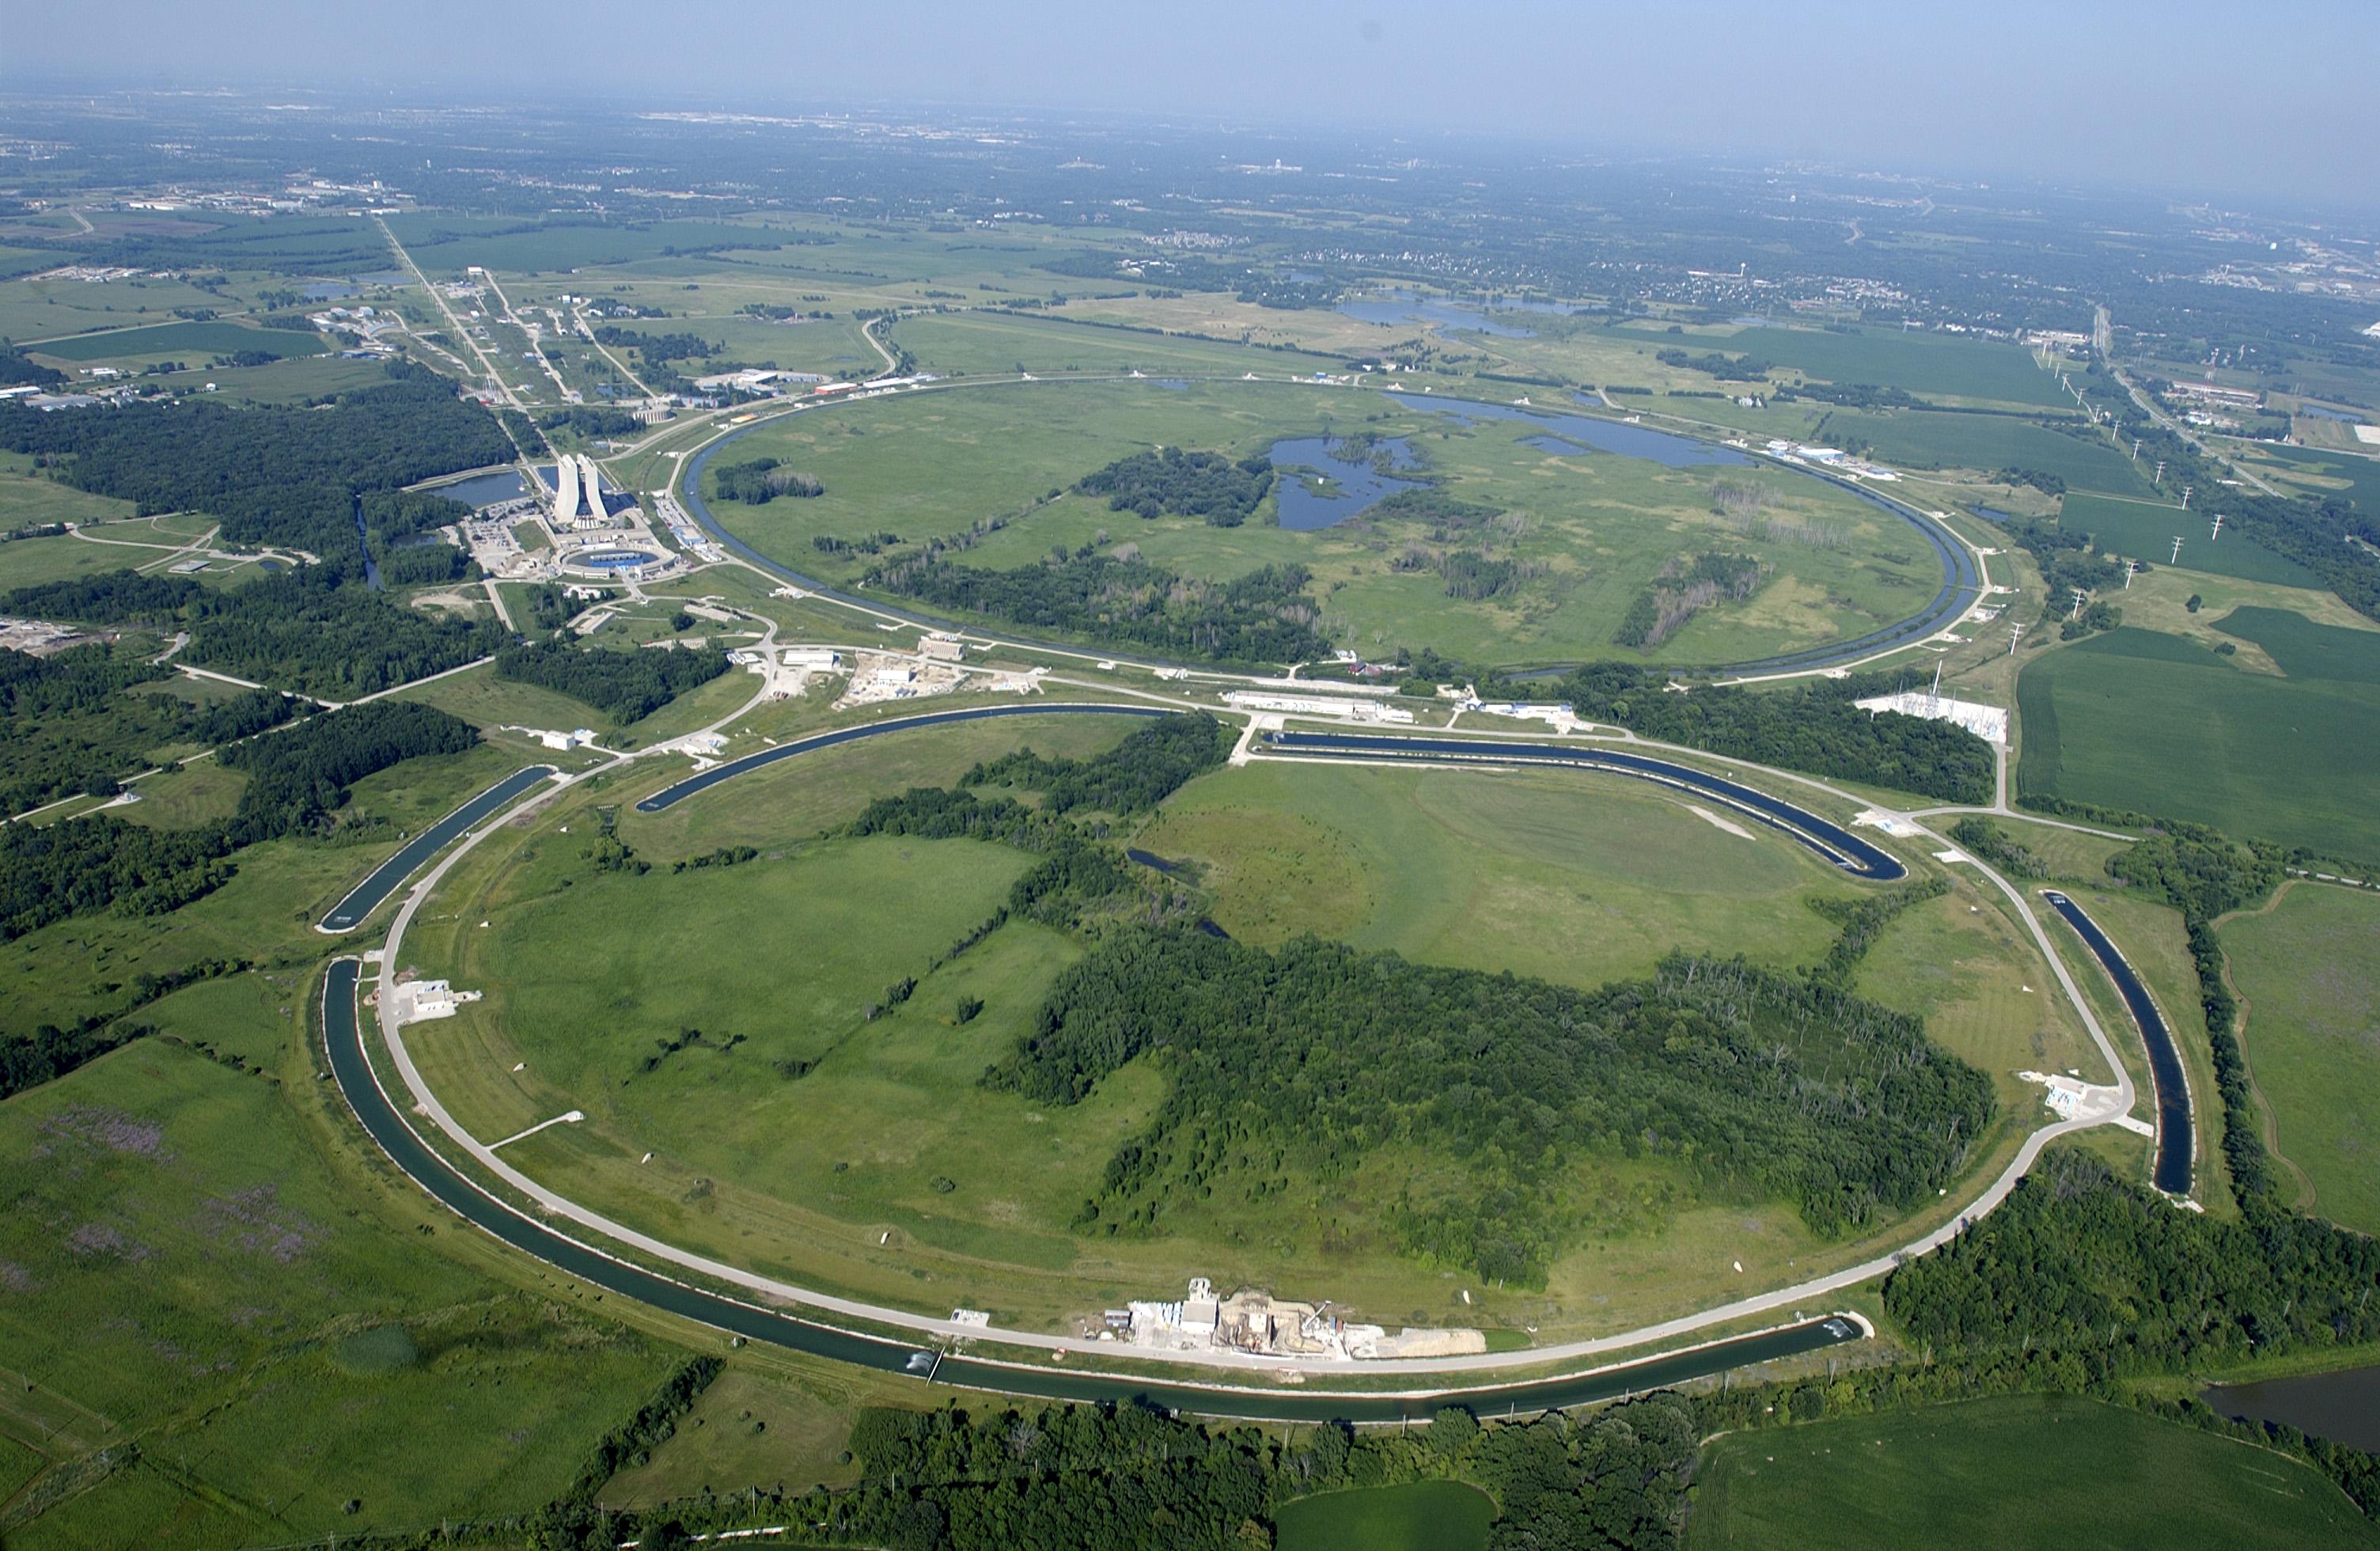 Depiction of Fermilab